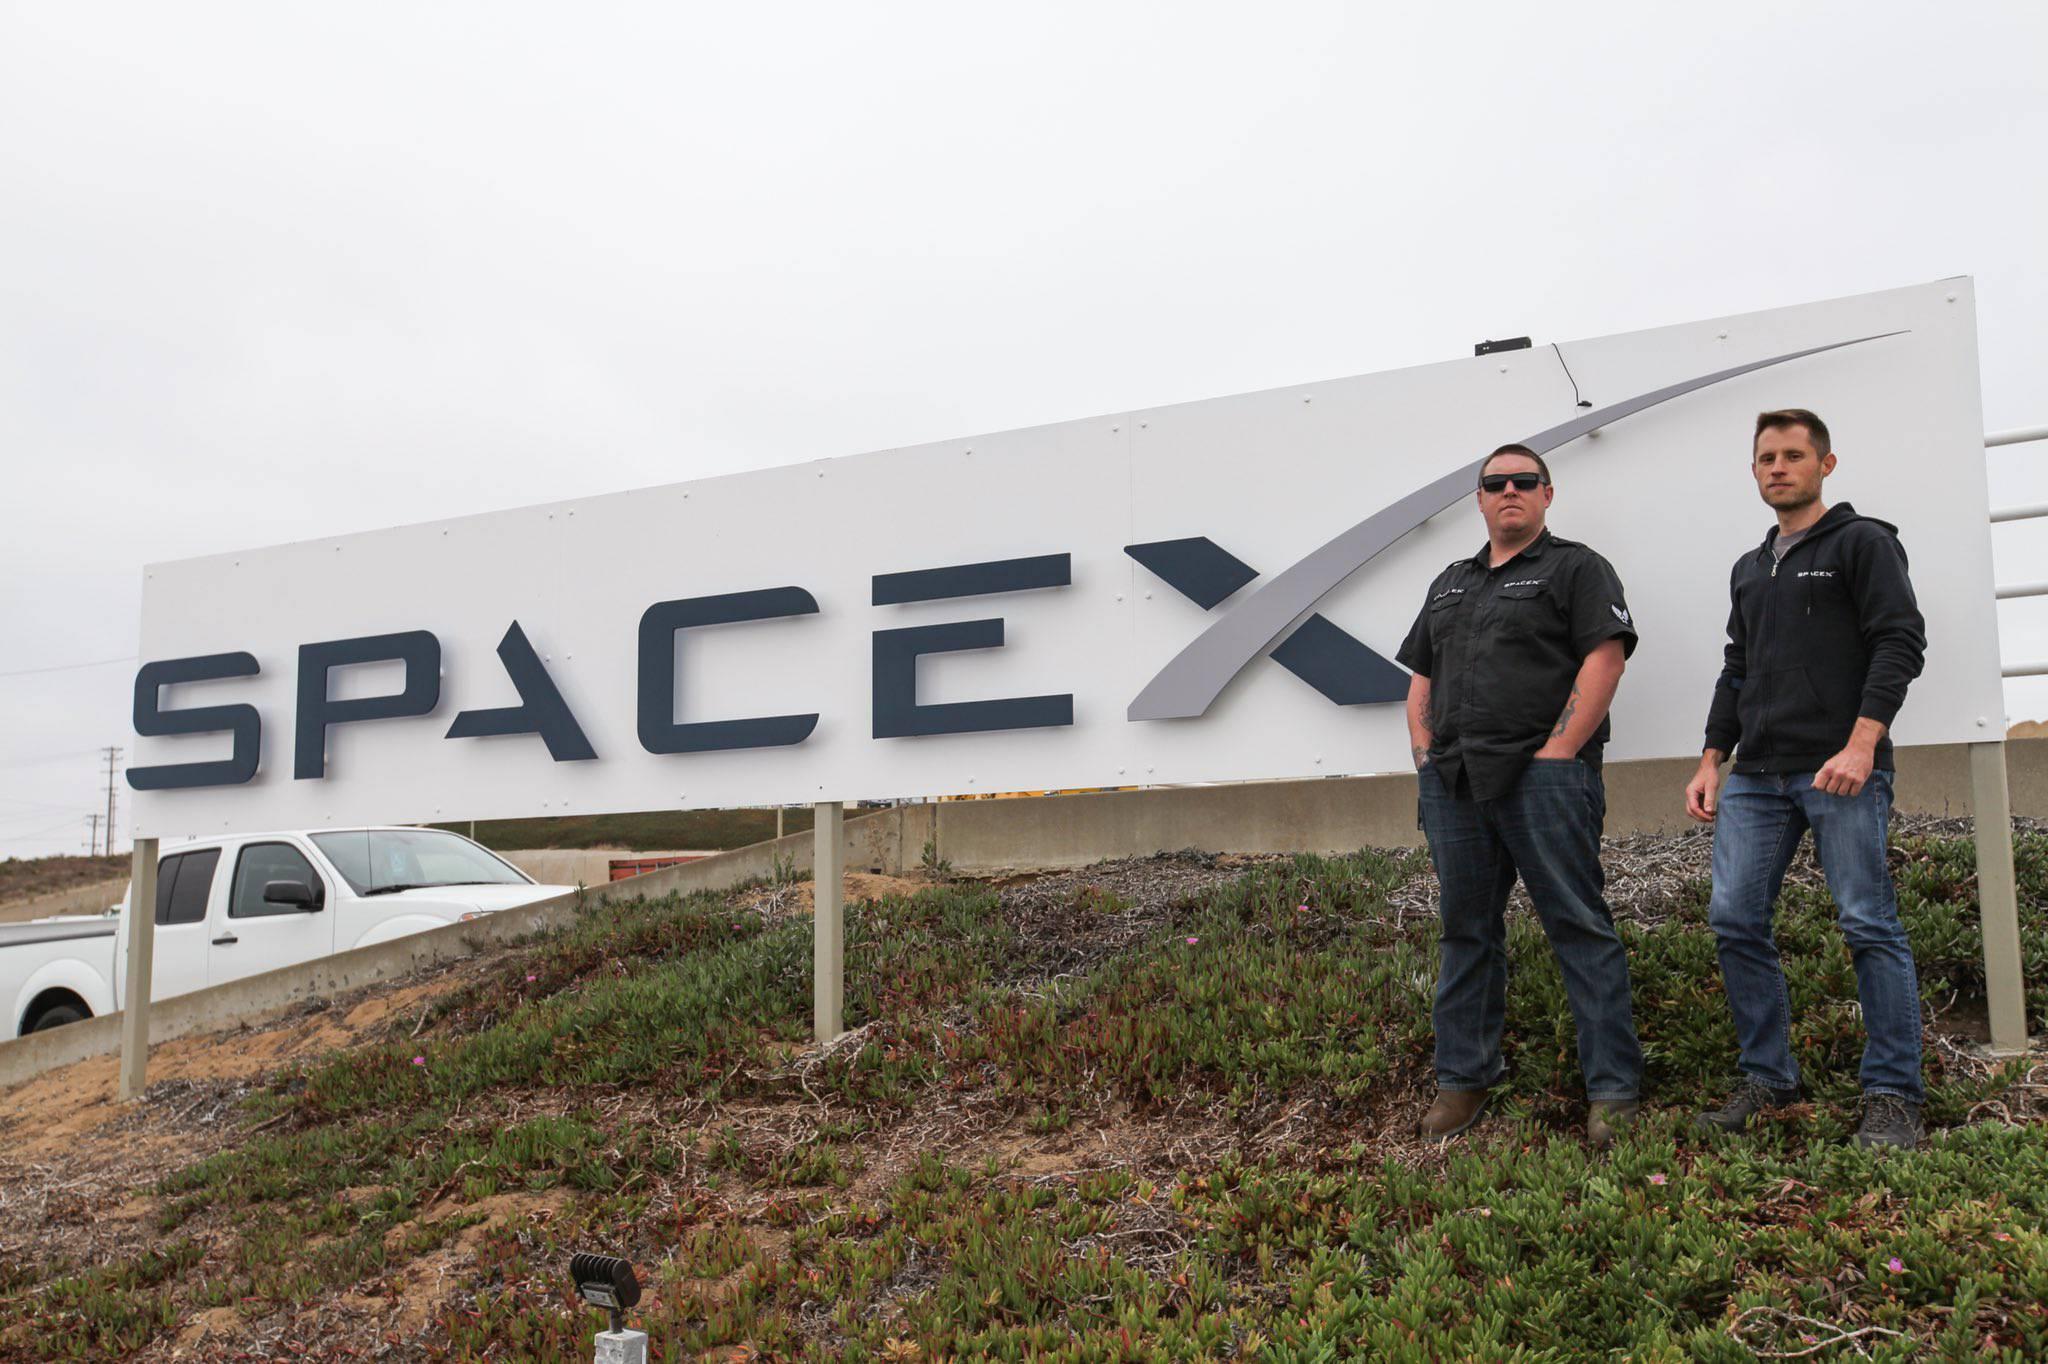 Falcon 1 Flight 4 10 year anniversary SLC-4 (SpaceX)